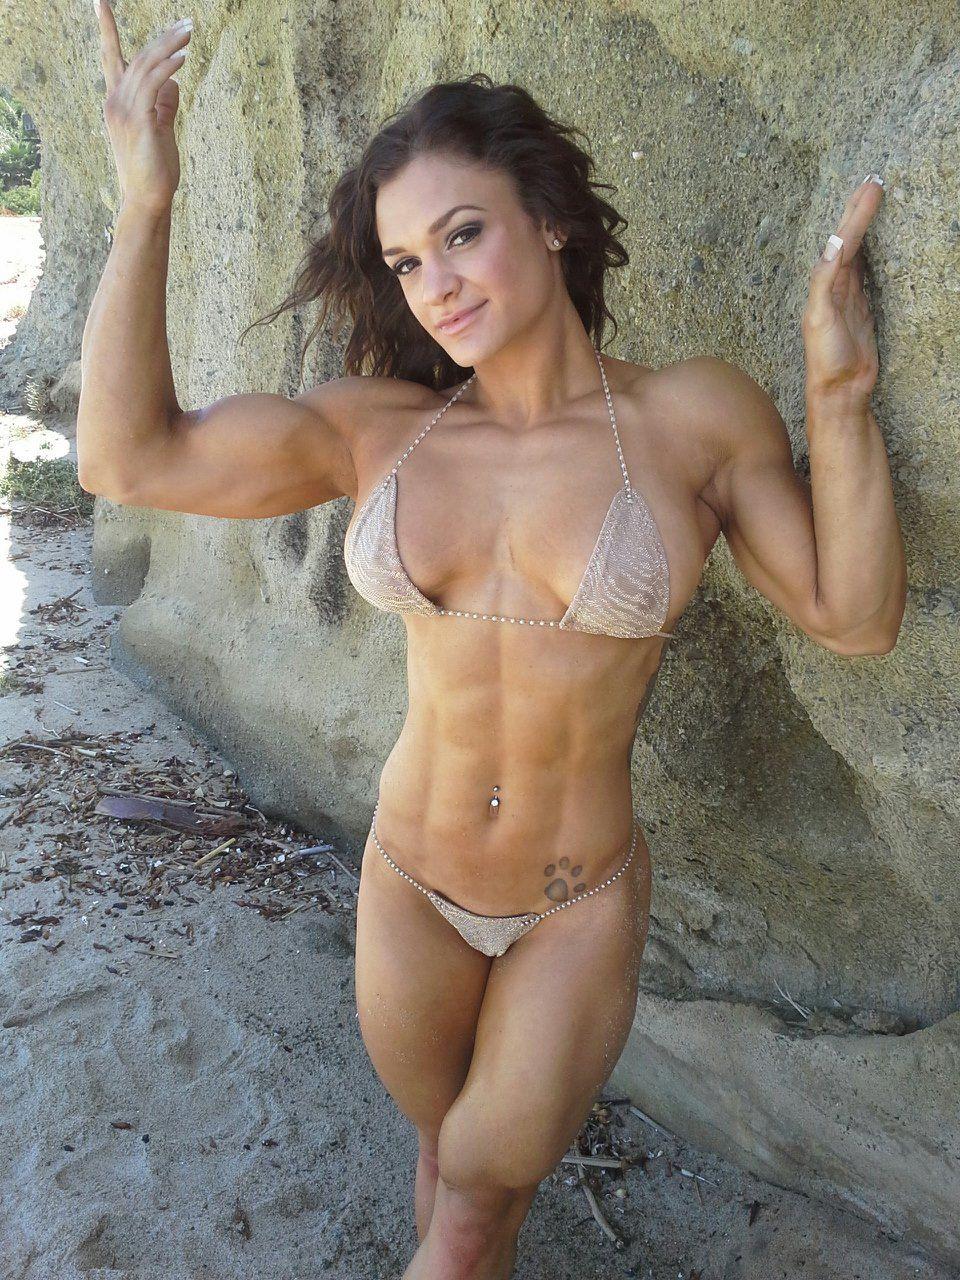 nude babe hard Girl fitness body